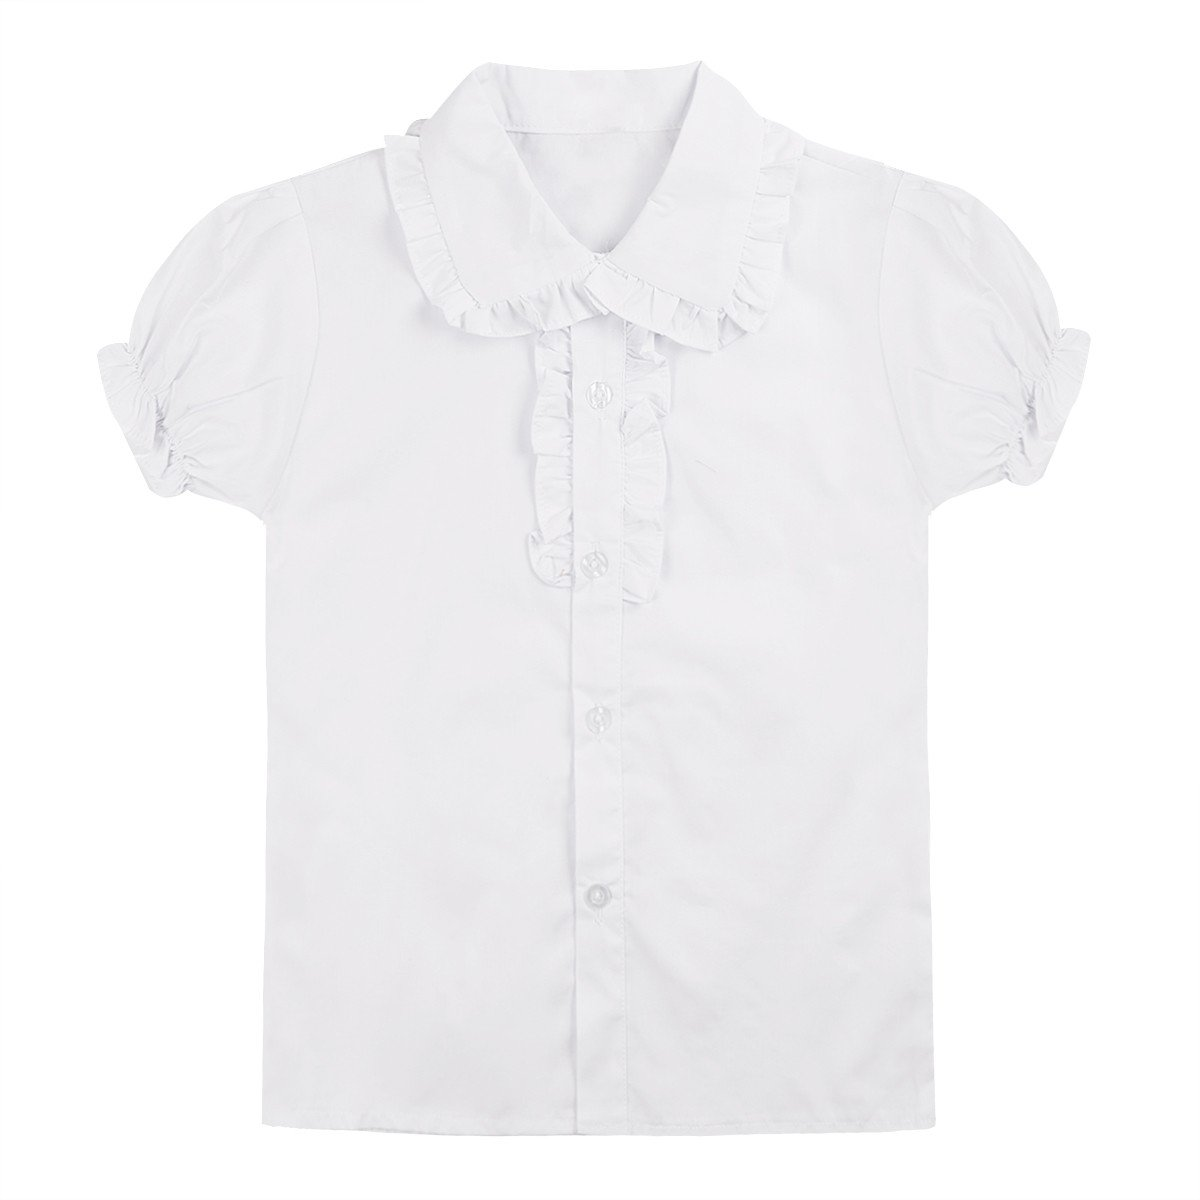 YiZYiF White School Uniform Tops Long/Short Sleeve Ruffle Collar Blouse for Little Big Girls